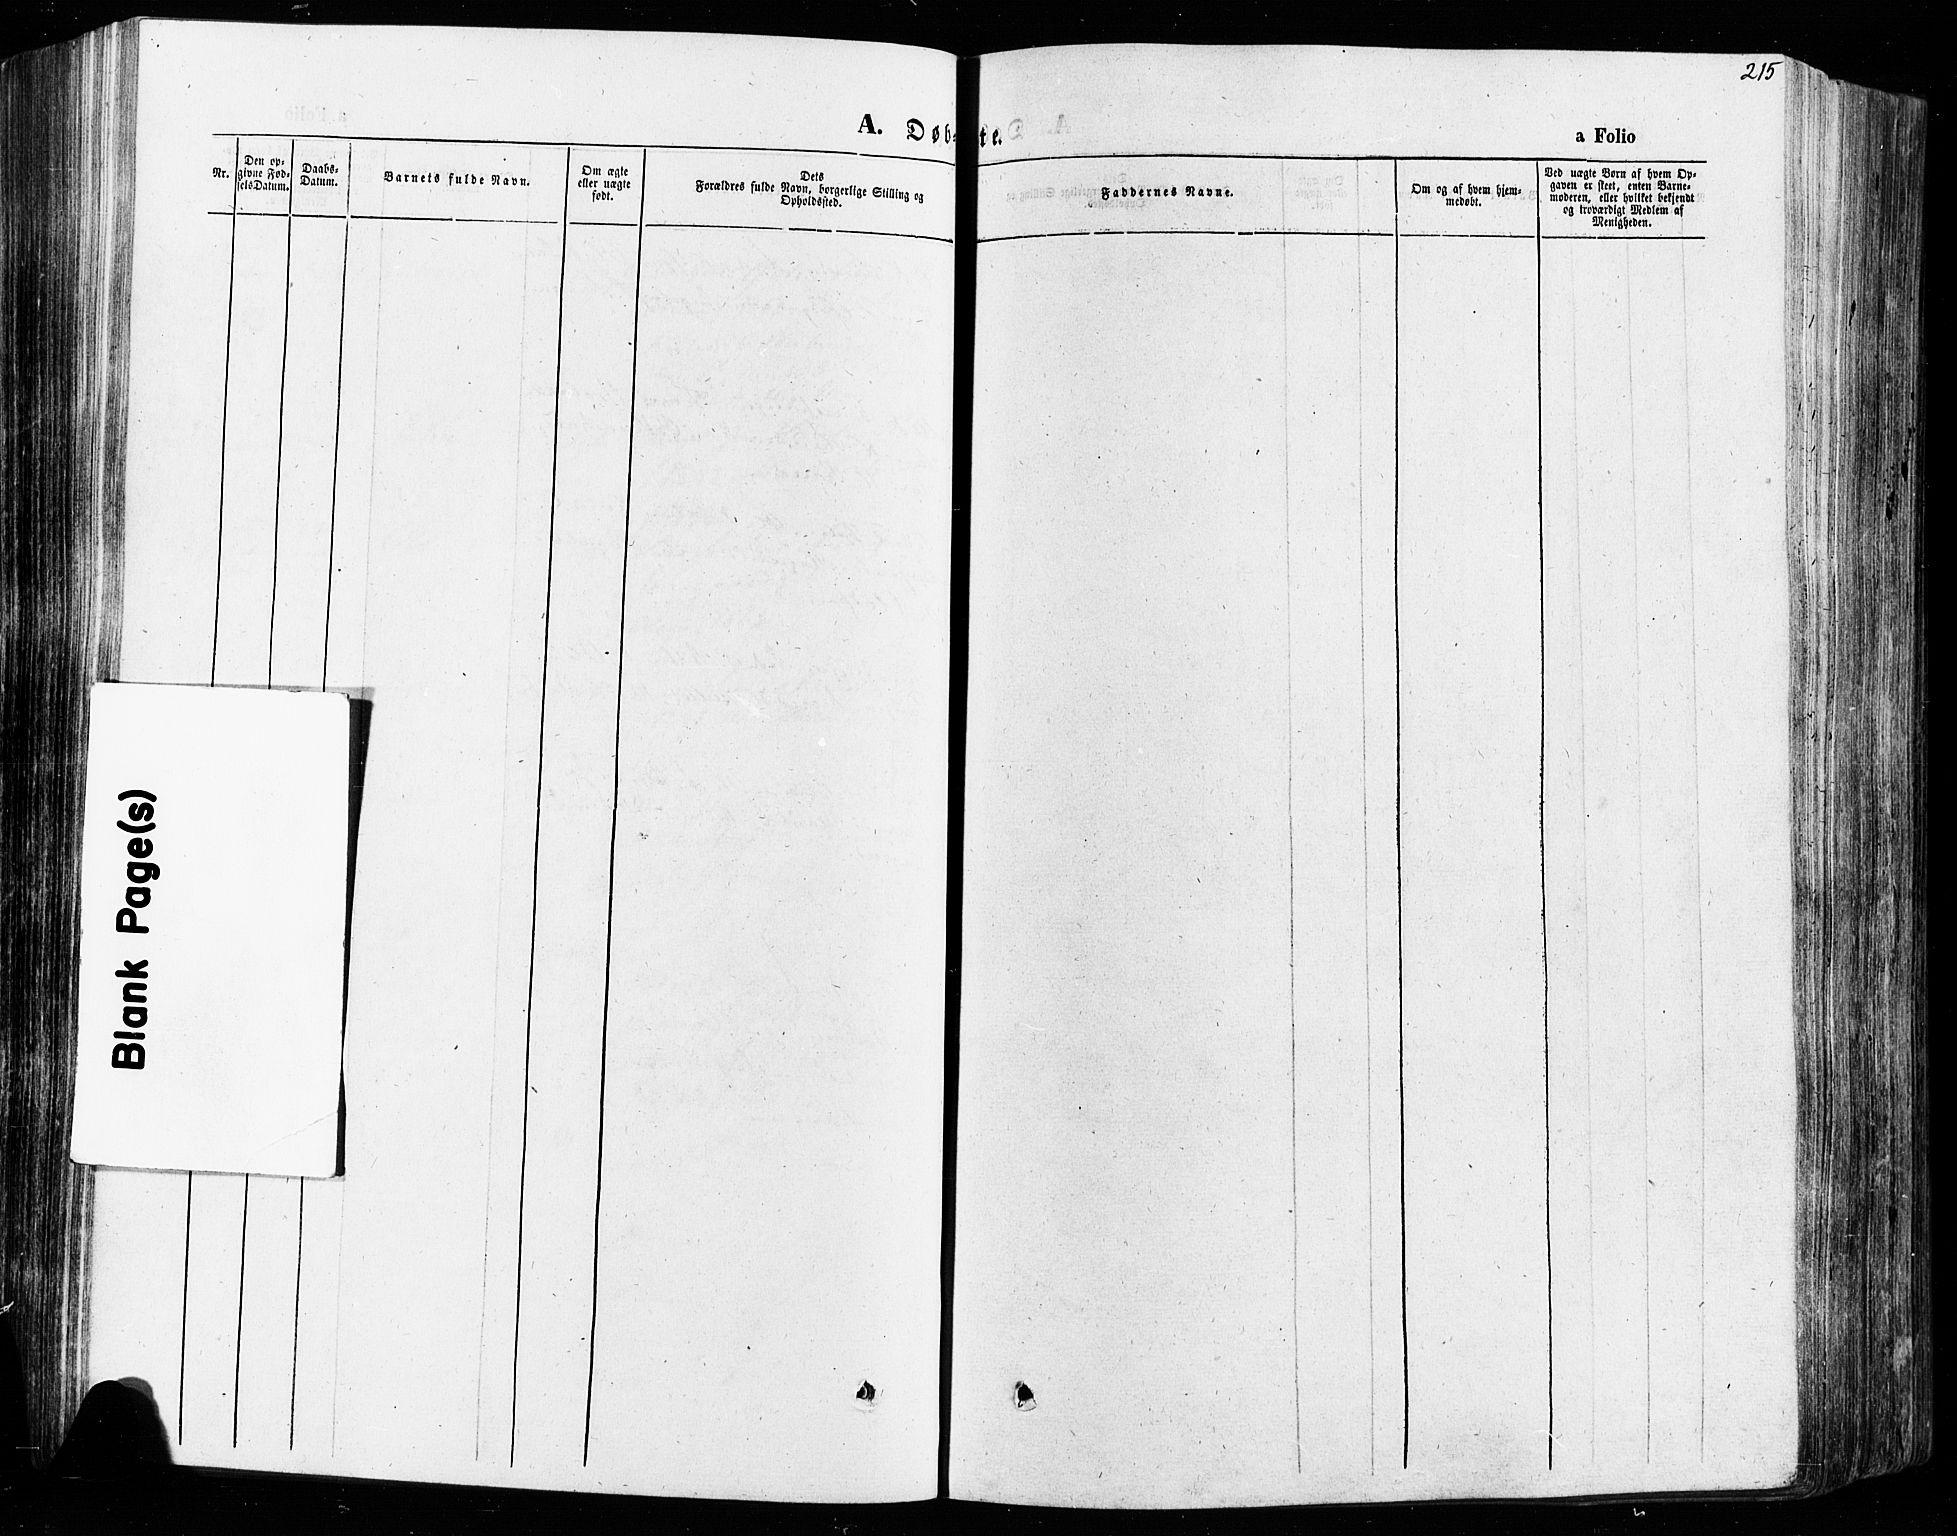 SAH, Vågå prestekontor, Ministerialbok nr. 7 /2, 1873-1886, s. 215